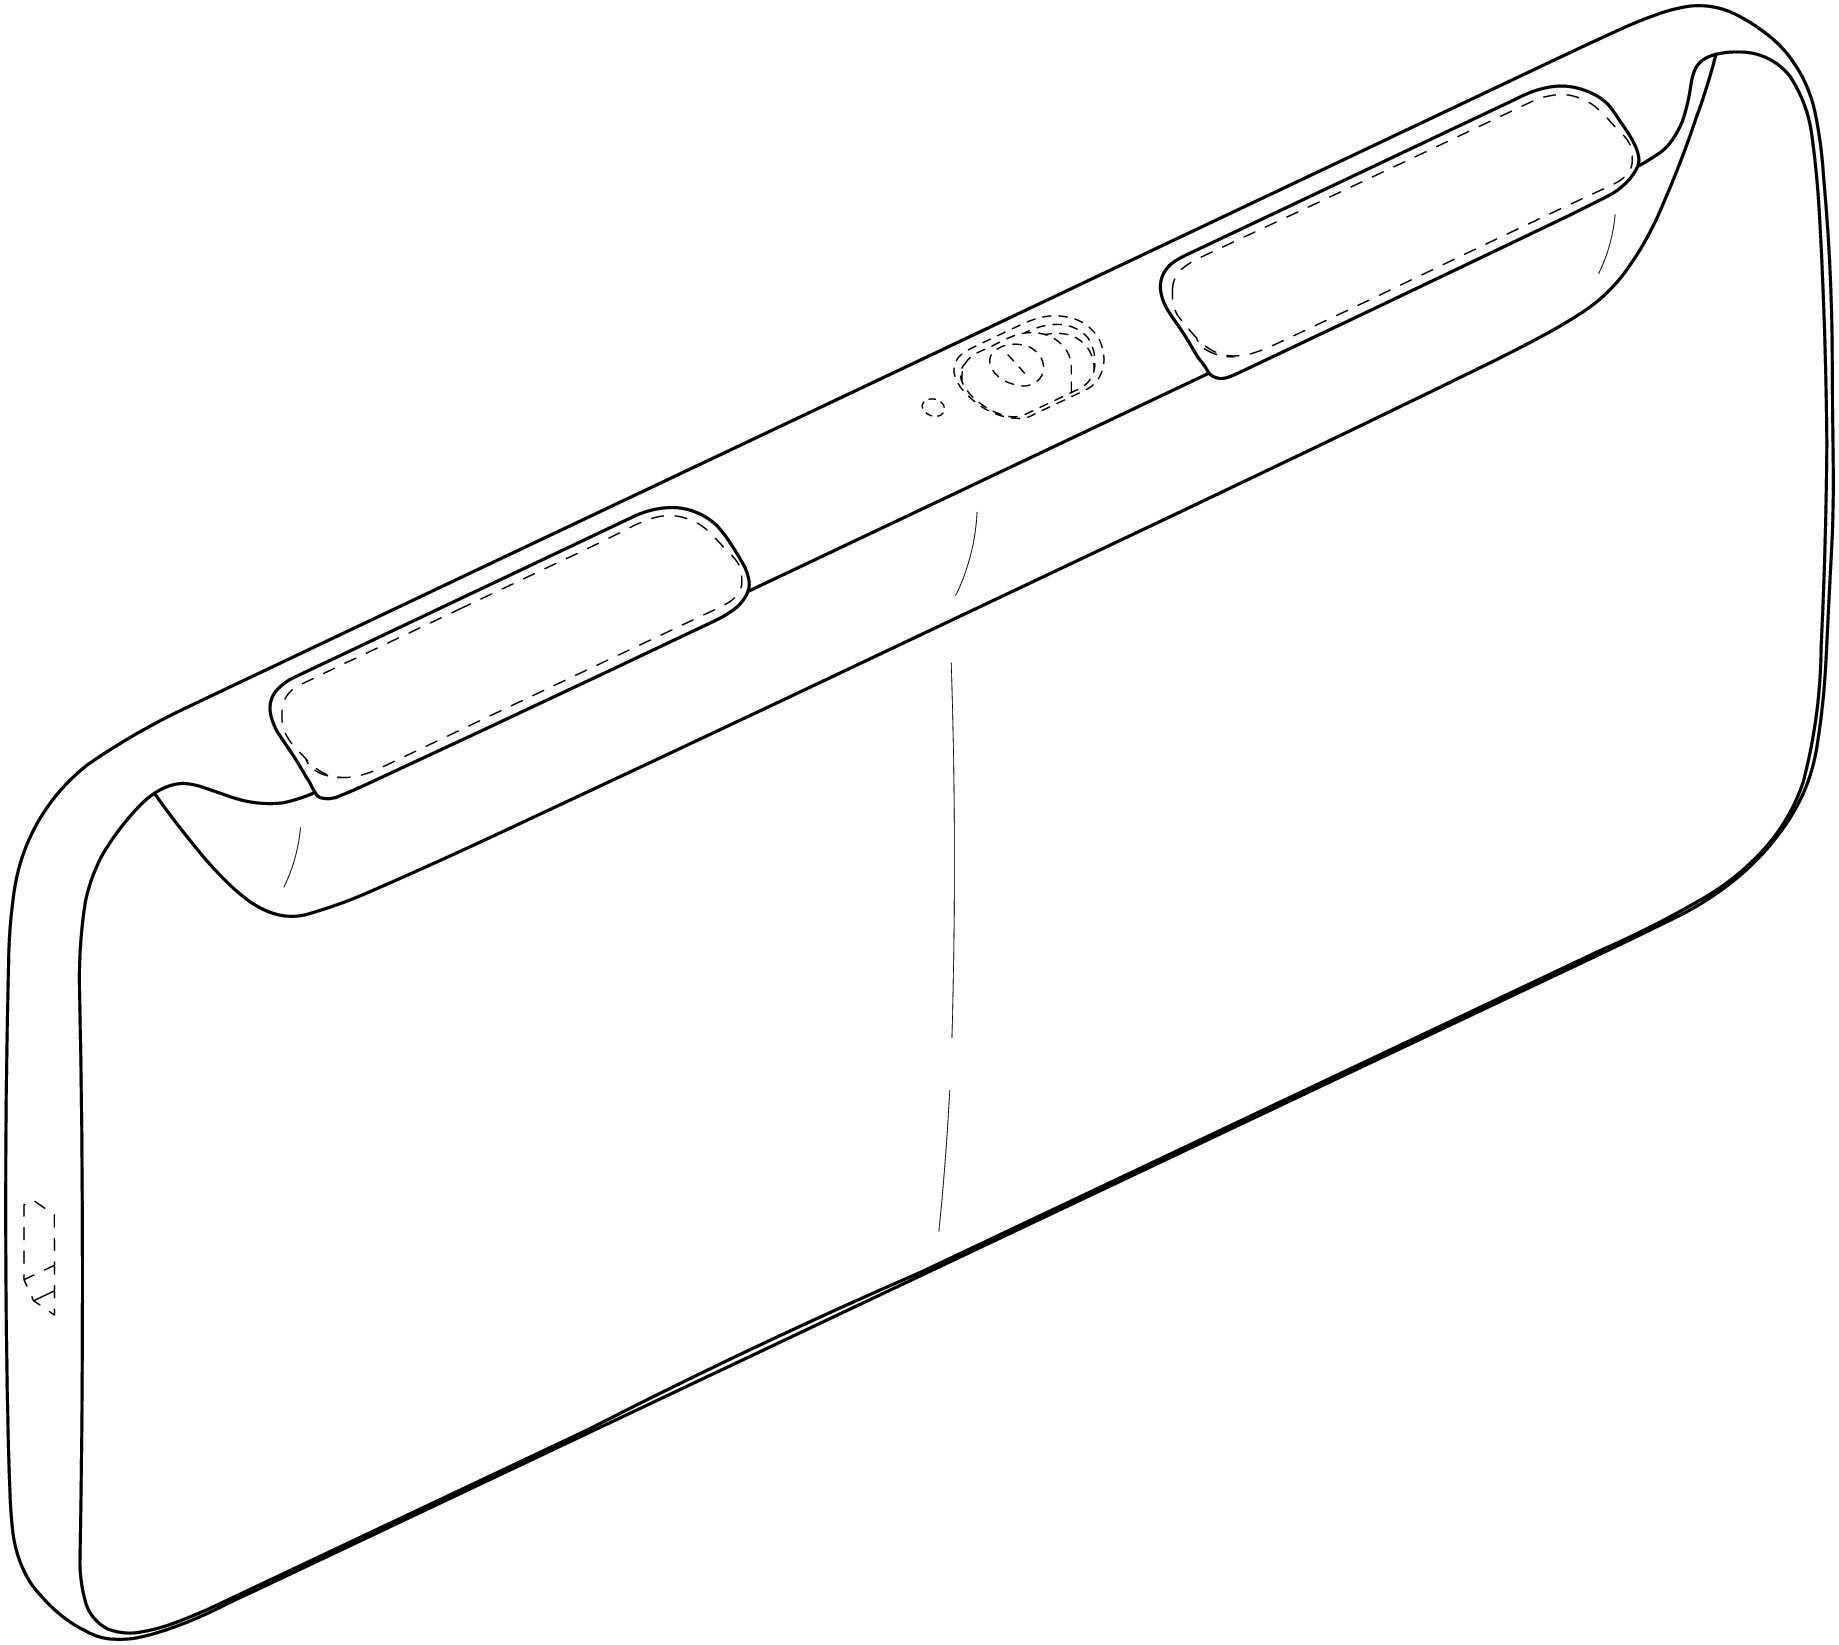 Samsung разрабатывает Bluetooth геймпад для Gear VR